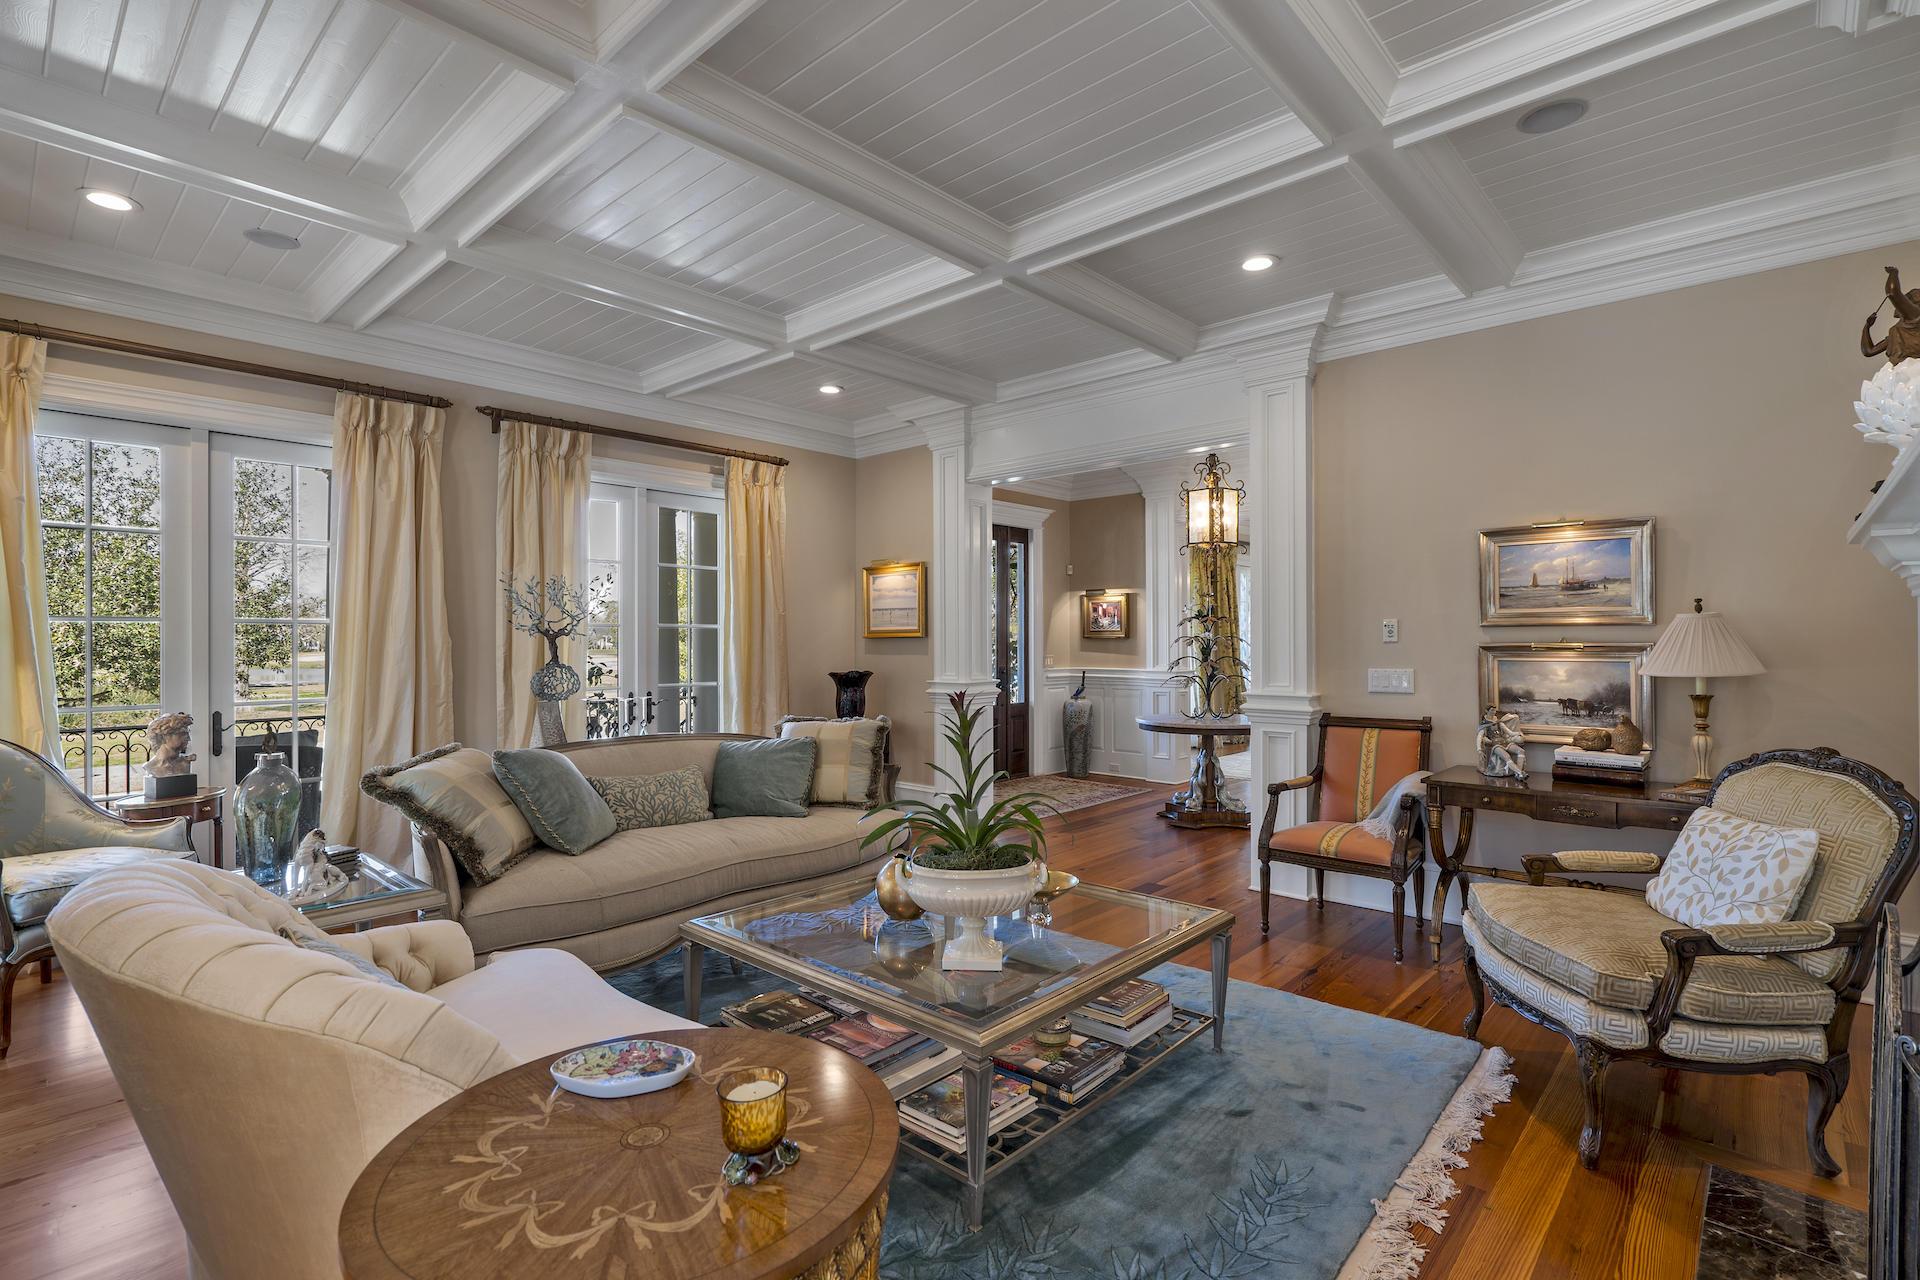 Daniel Island Homes For Sale - 623 Island Park, Charleston, SC - 33